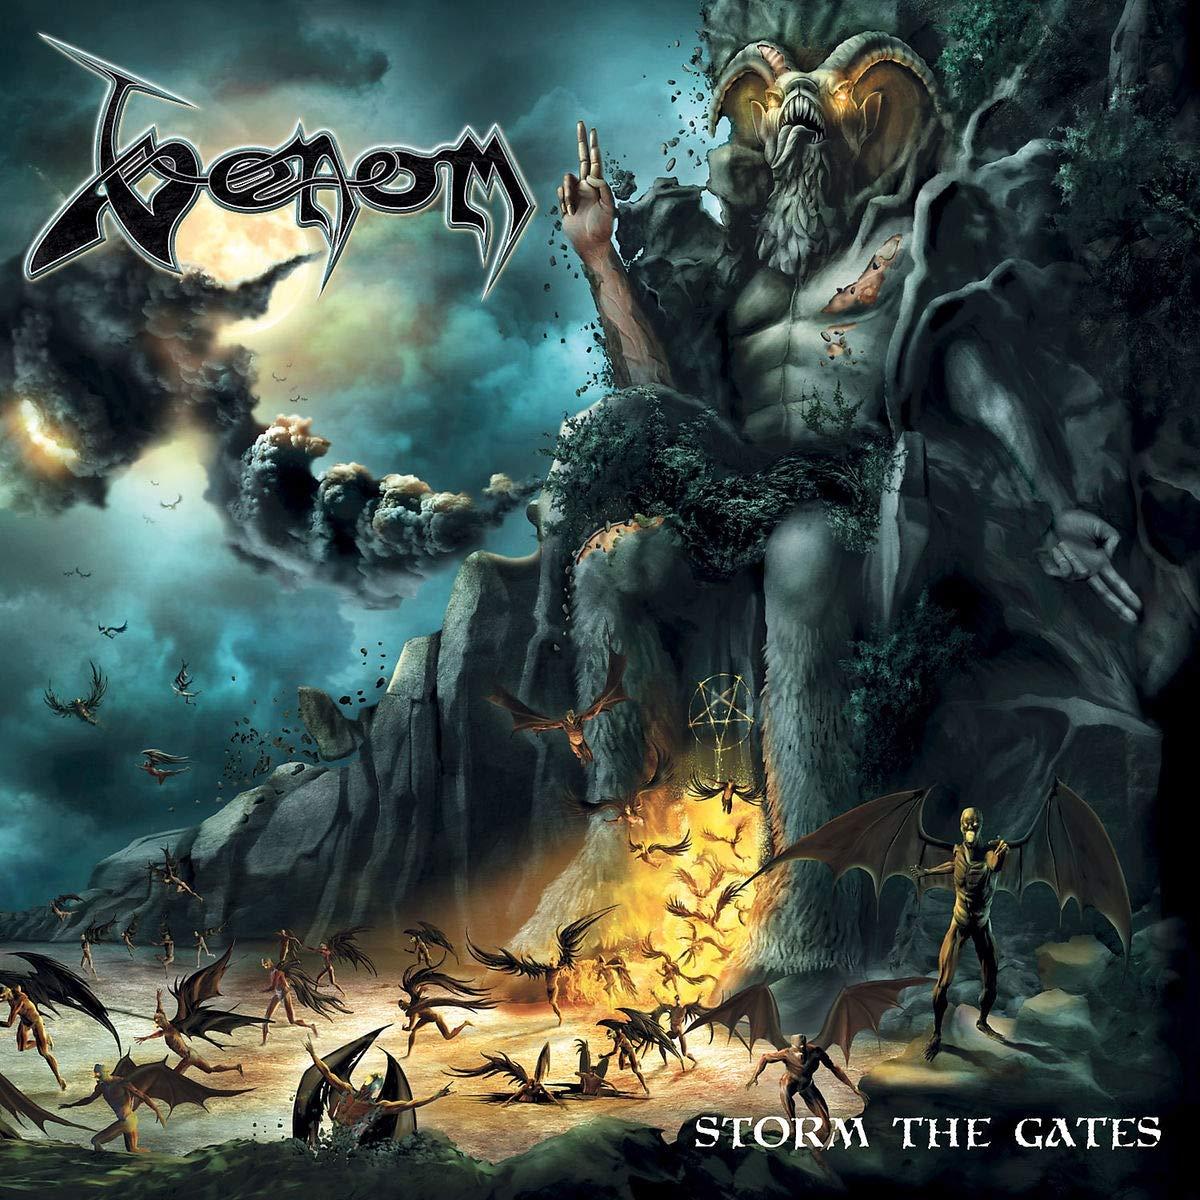 Venom Venom. Storm The Gates (2 LP) venom venom welcome to hell 2 lp 180 gr